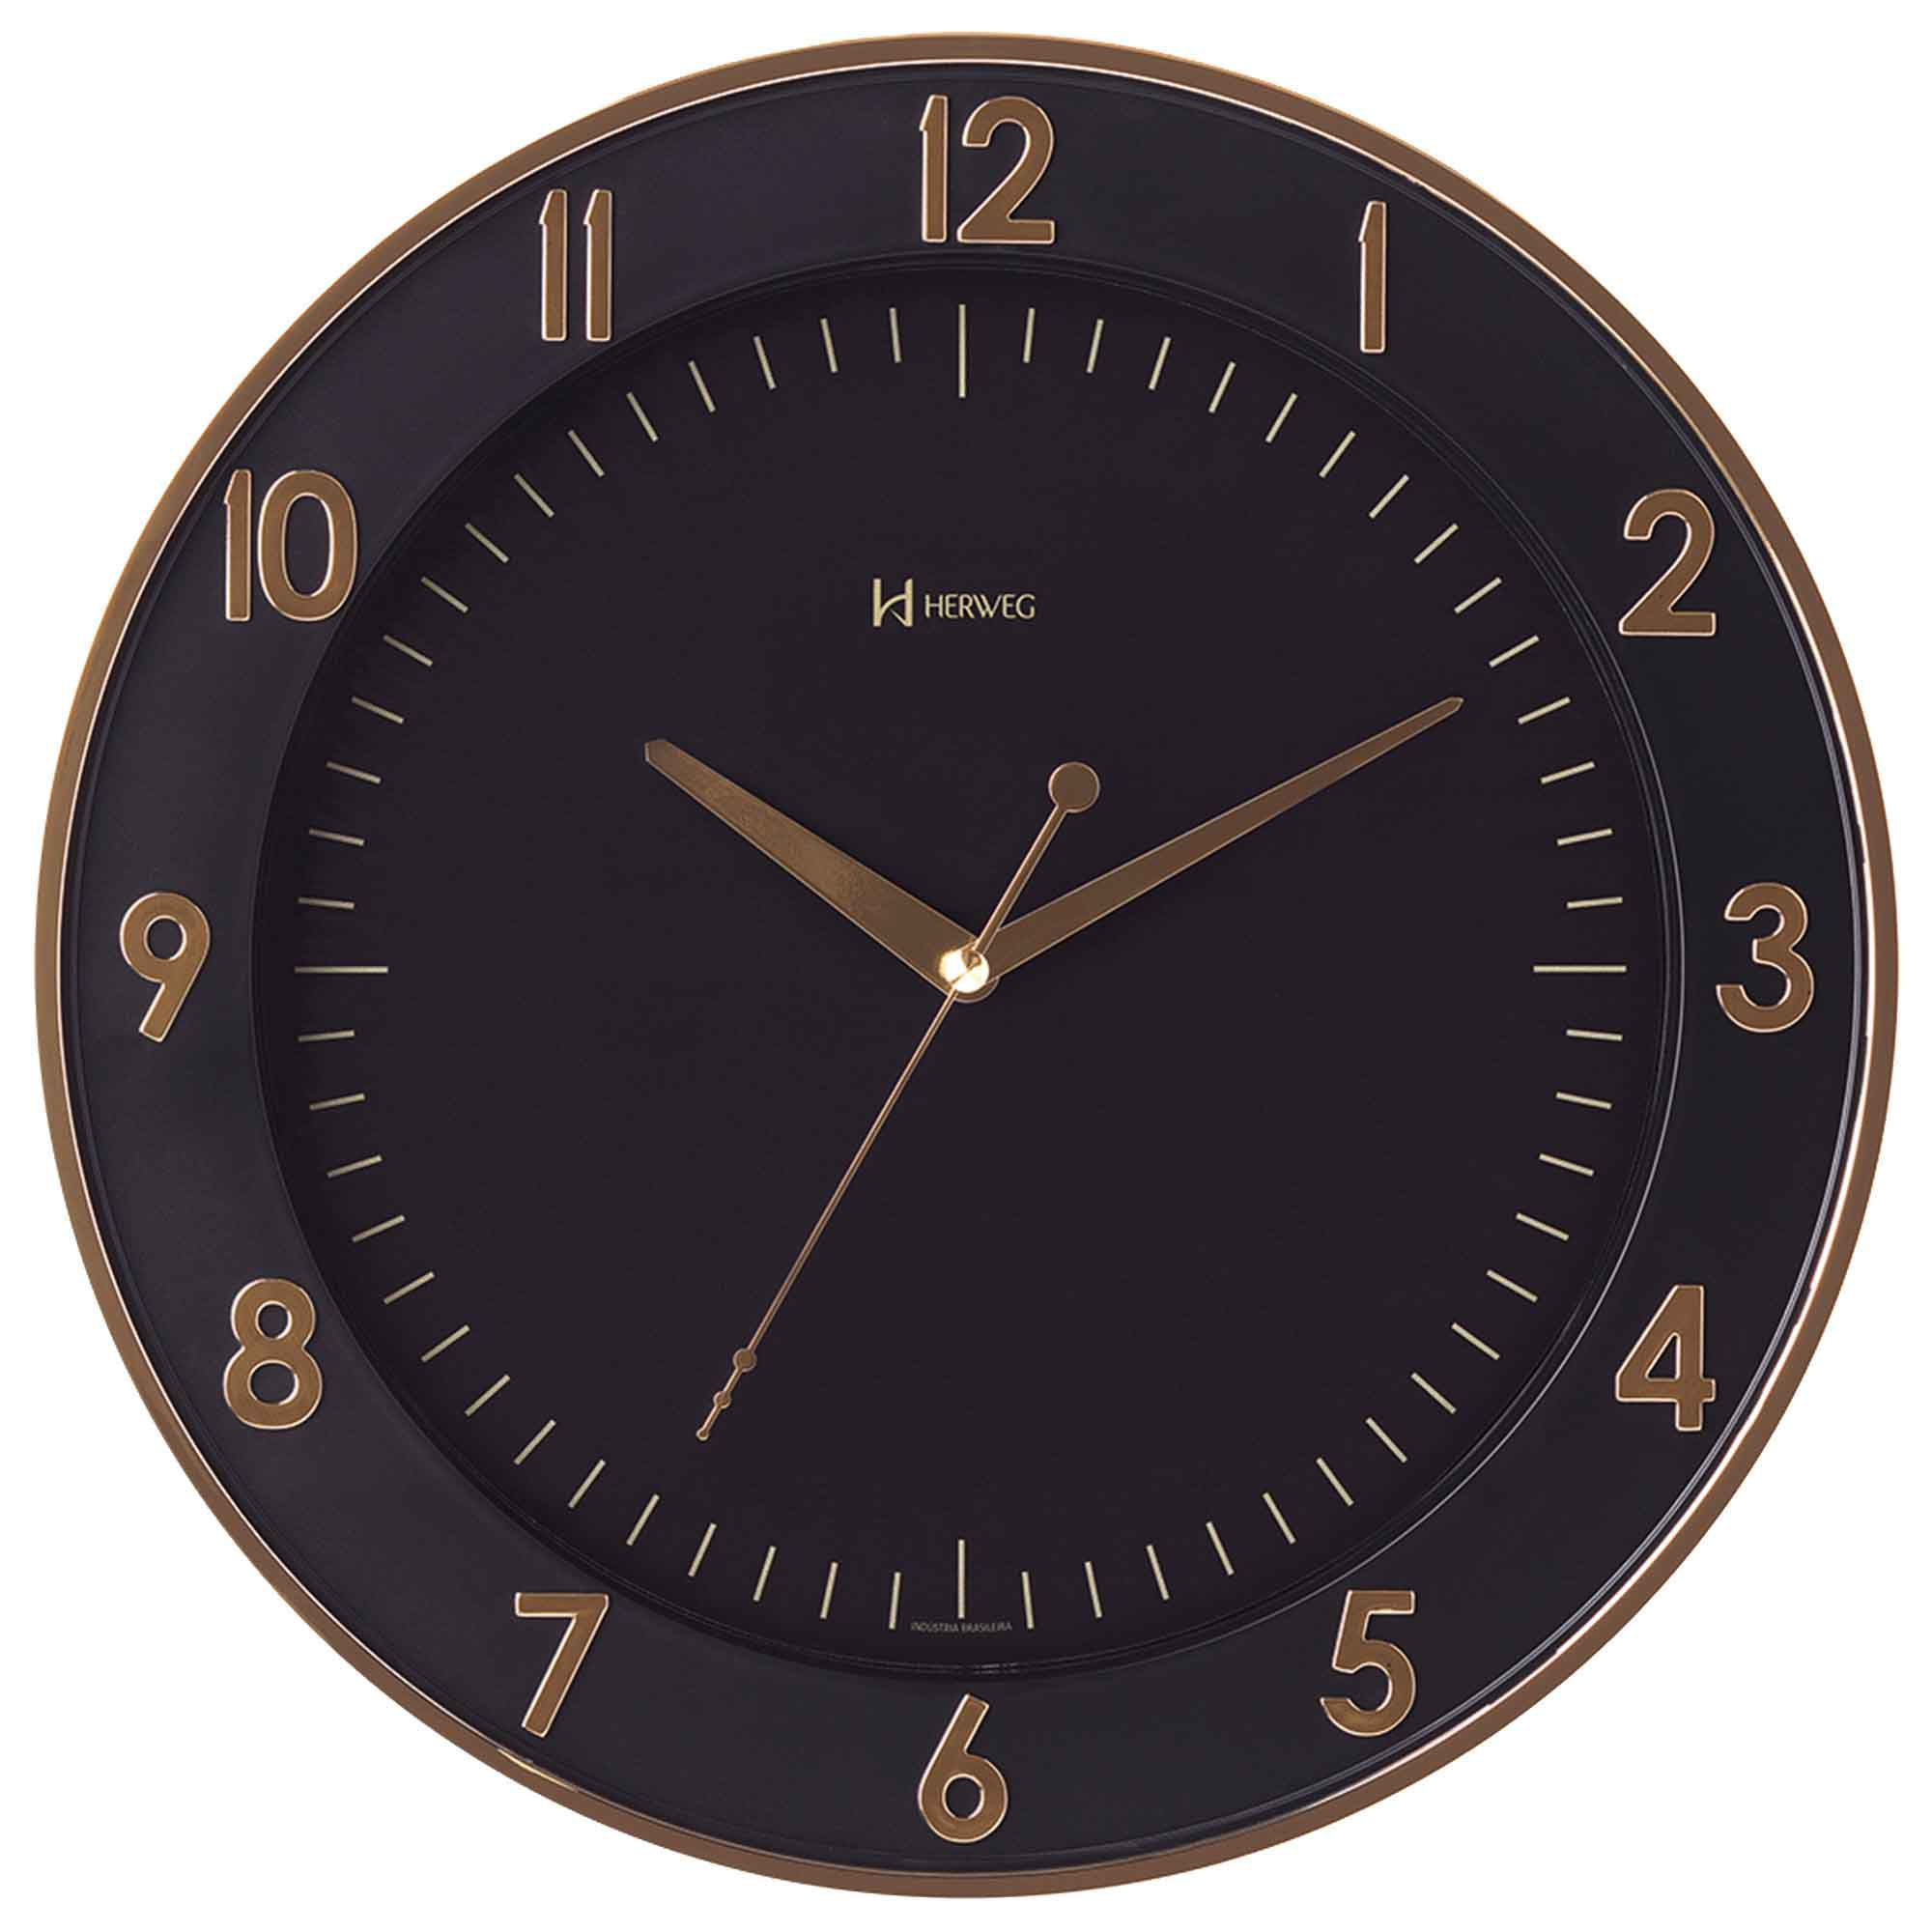 Relógio de Parede Analógico Herweg 6803 029 Dourado Claro